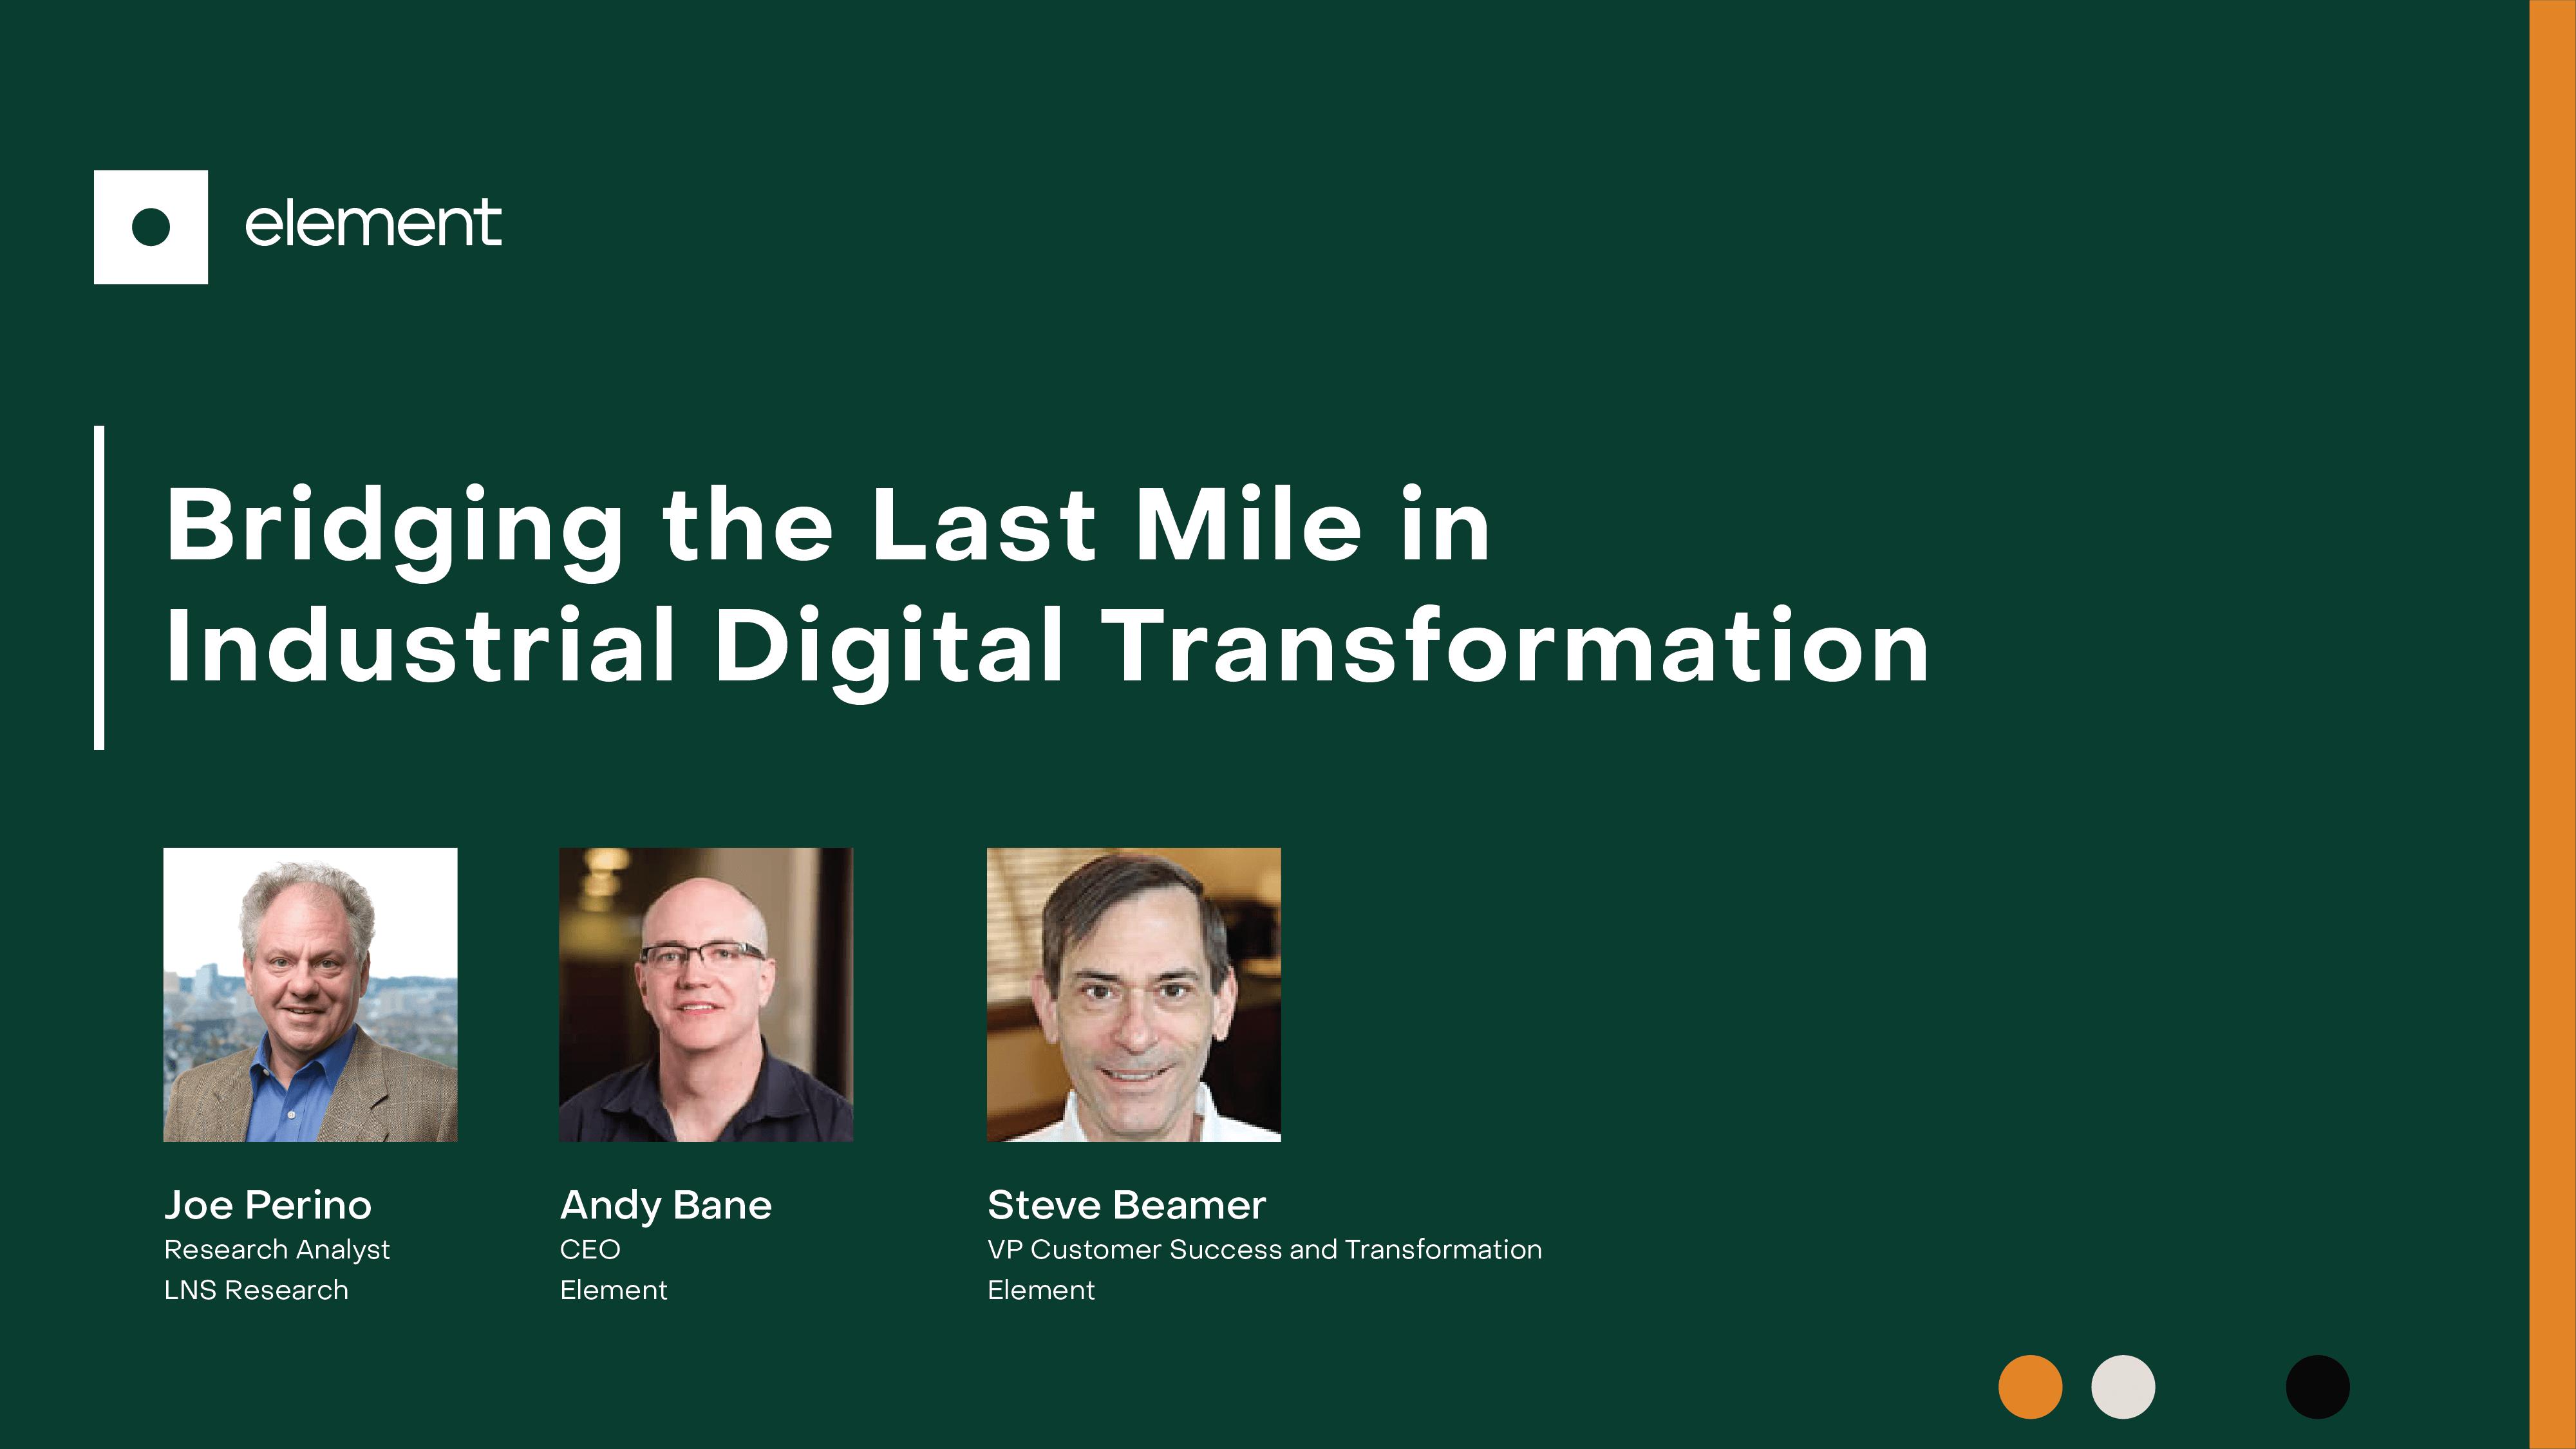 Bridging the Last Mile in Industrial Digital Transformation